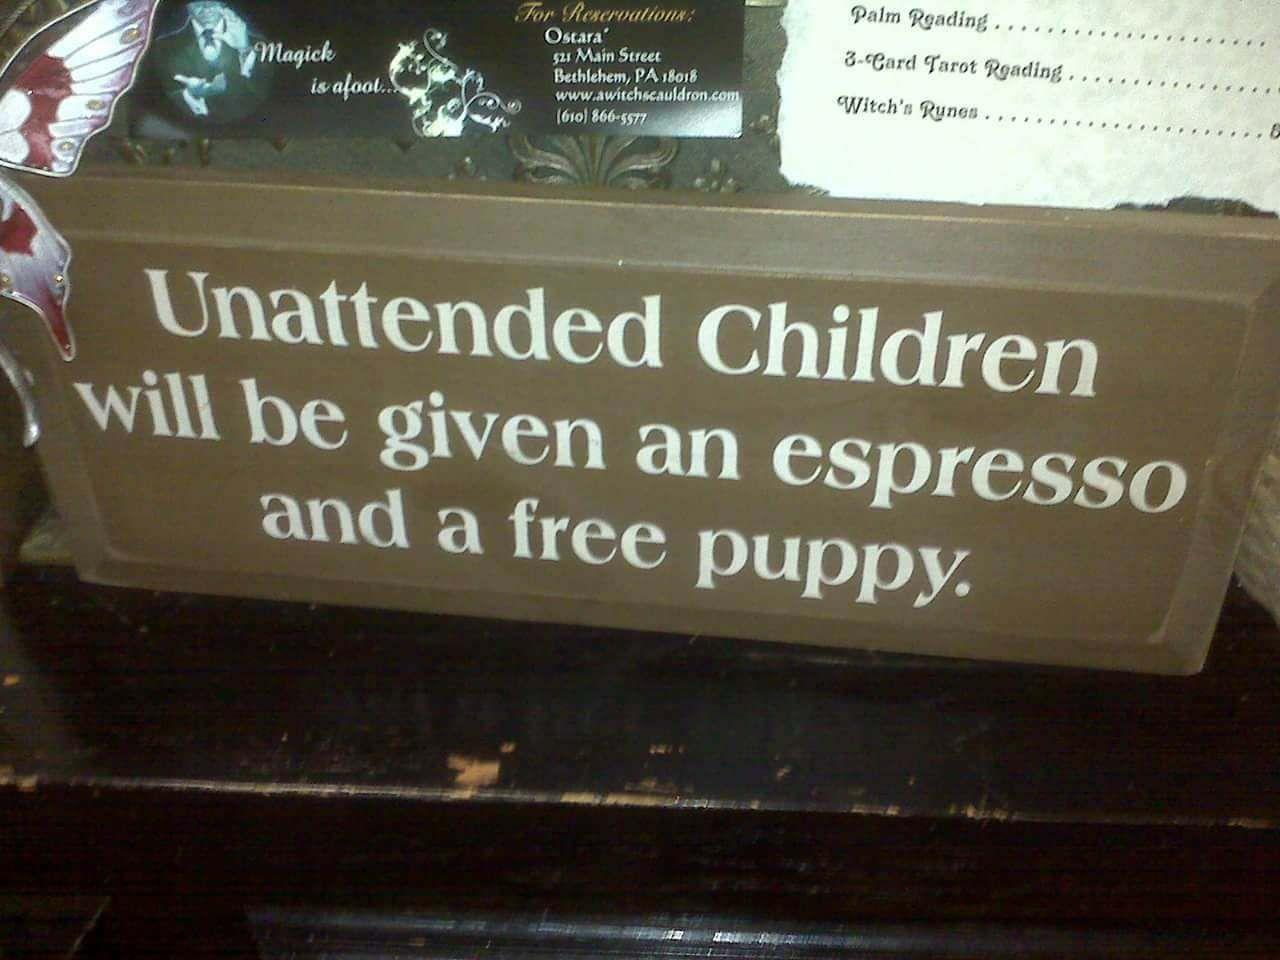 Reasonable measures will be taken parents.